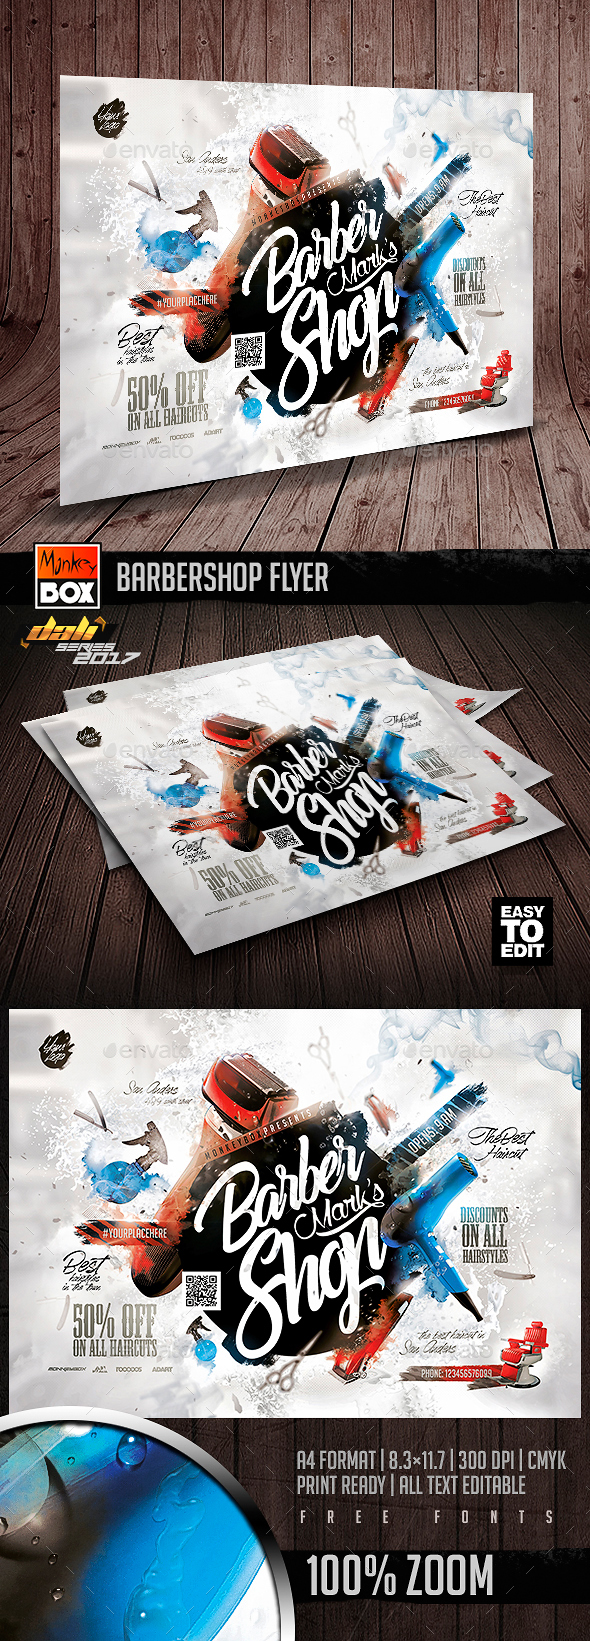 GraphicRiver Barbershop Flyer 20776480